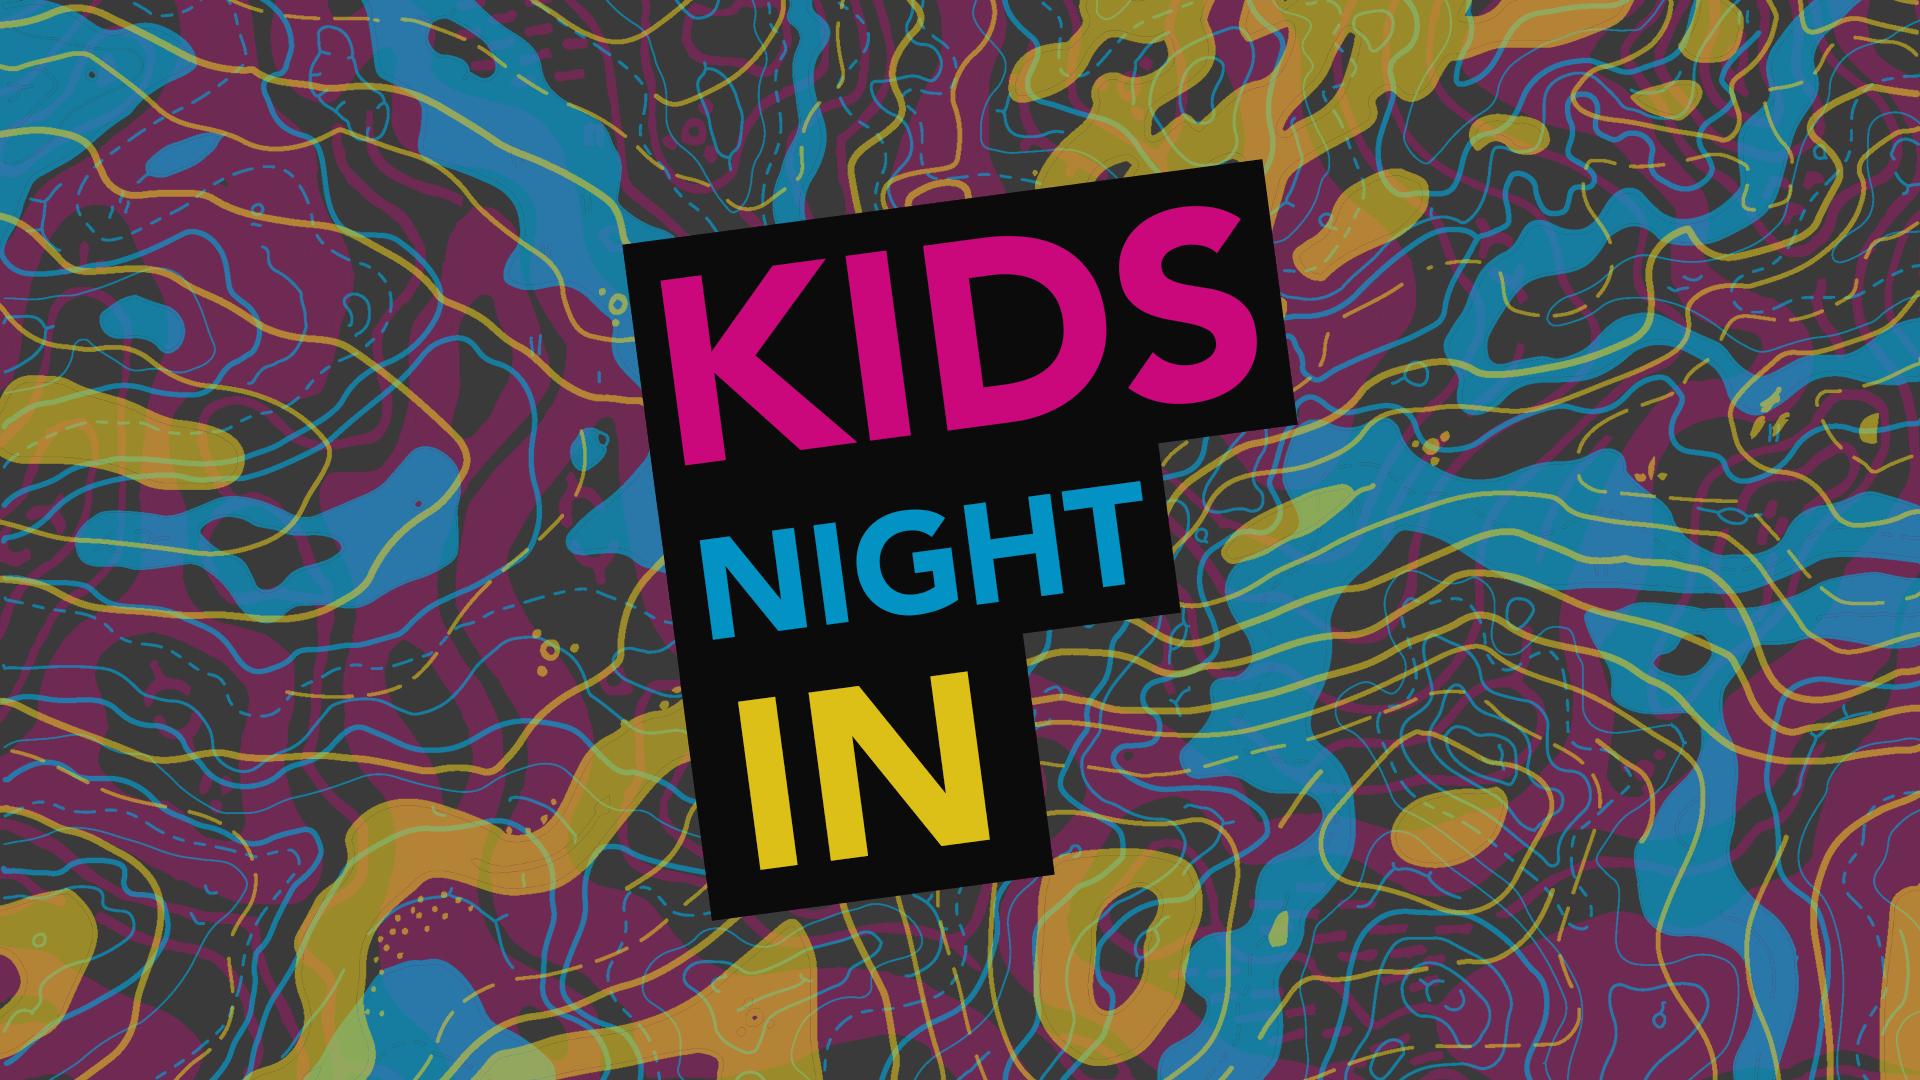 Kids Night In - October 18th logo